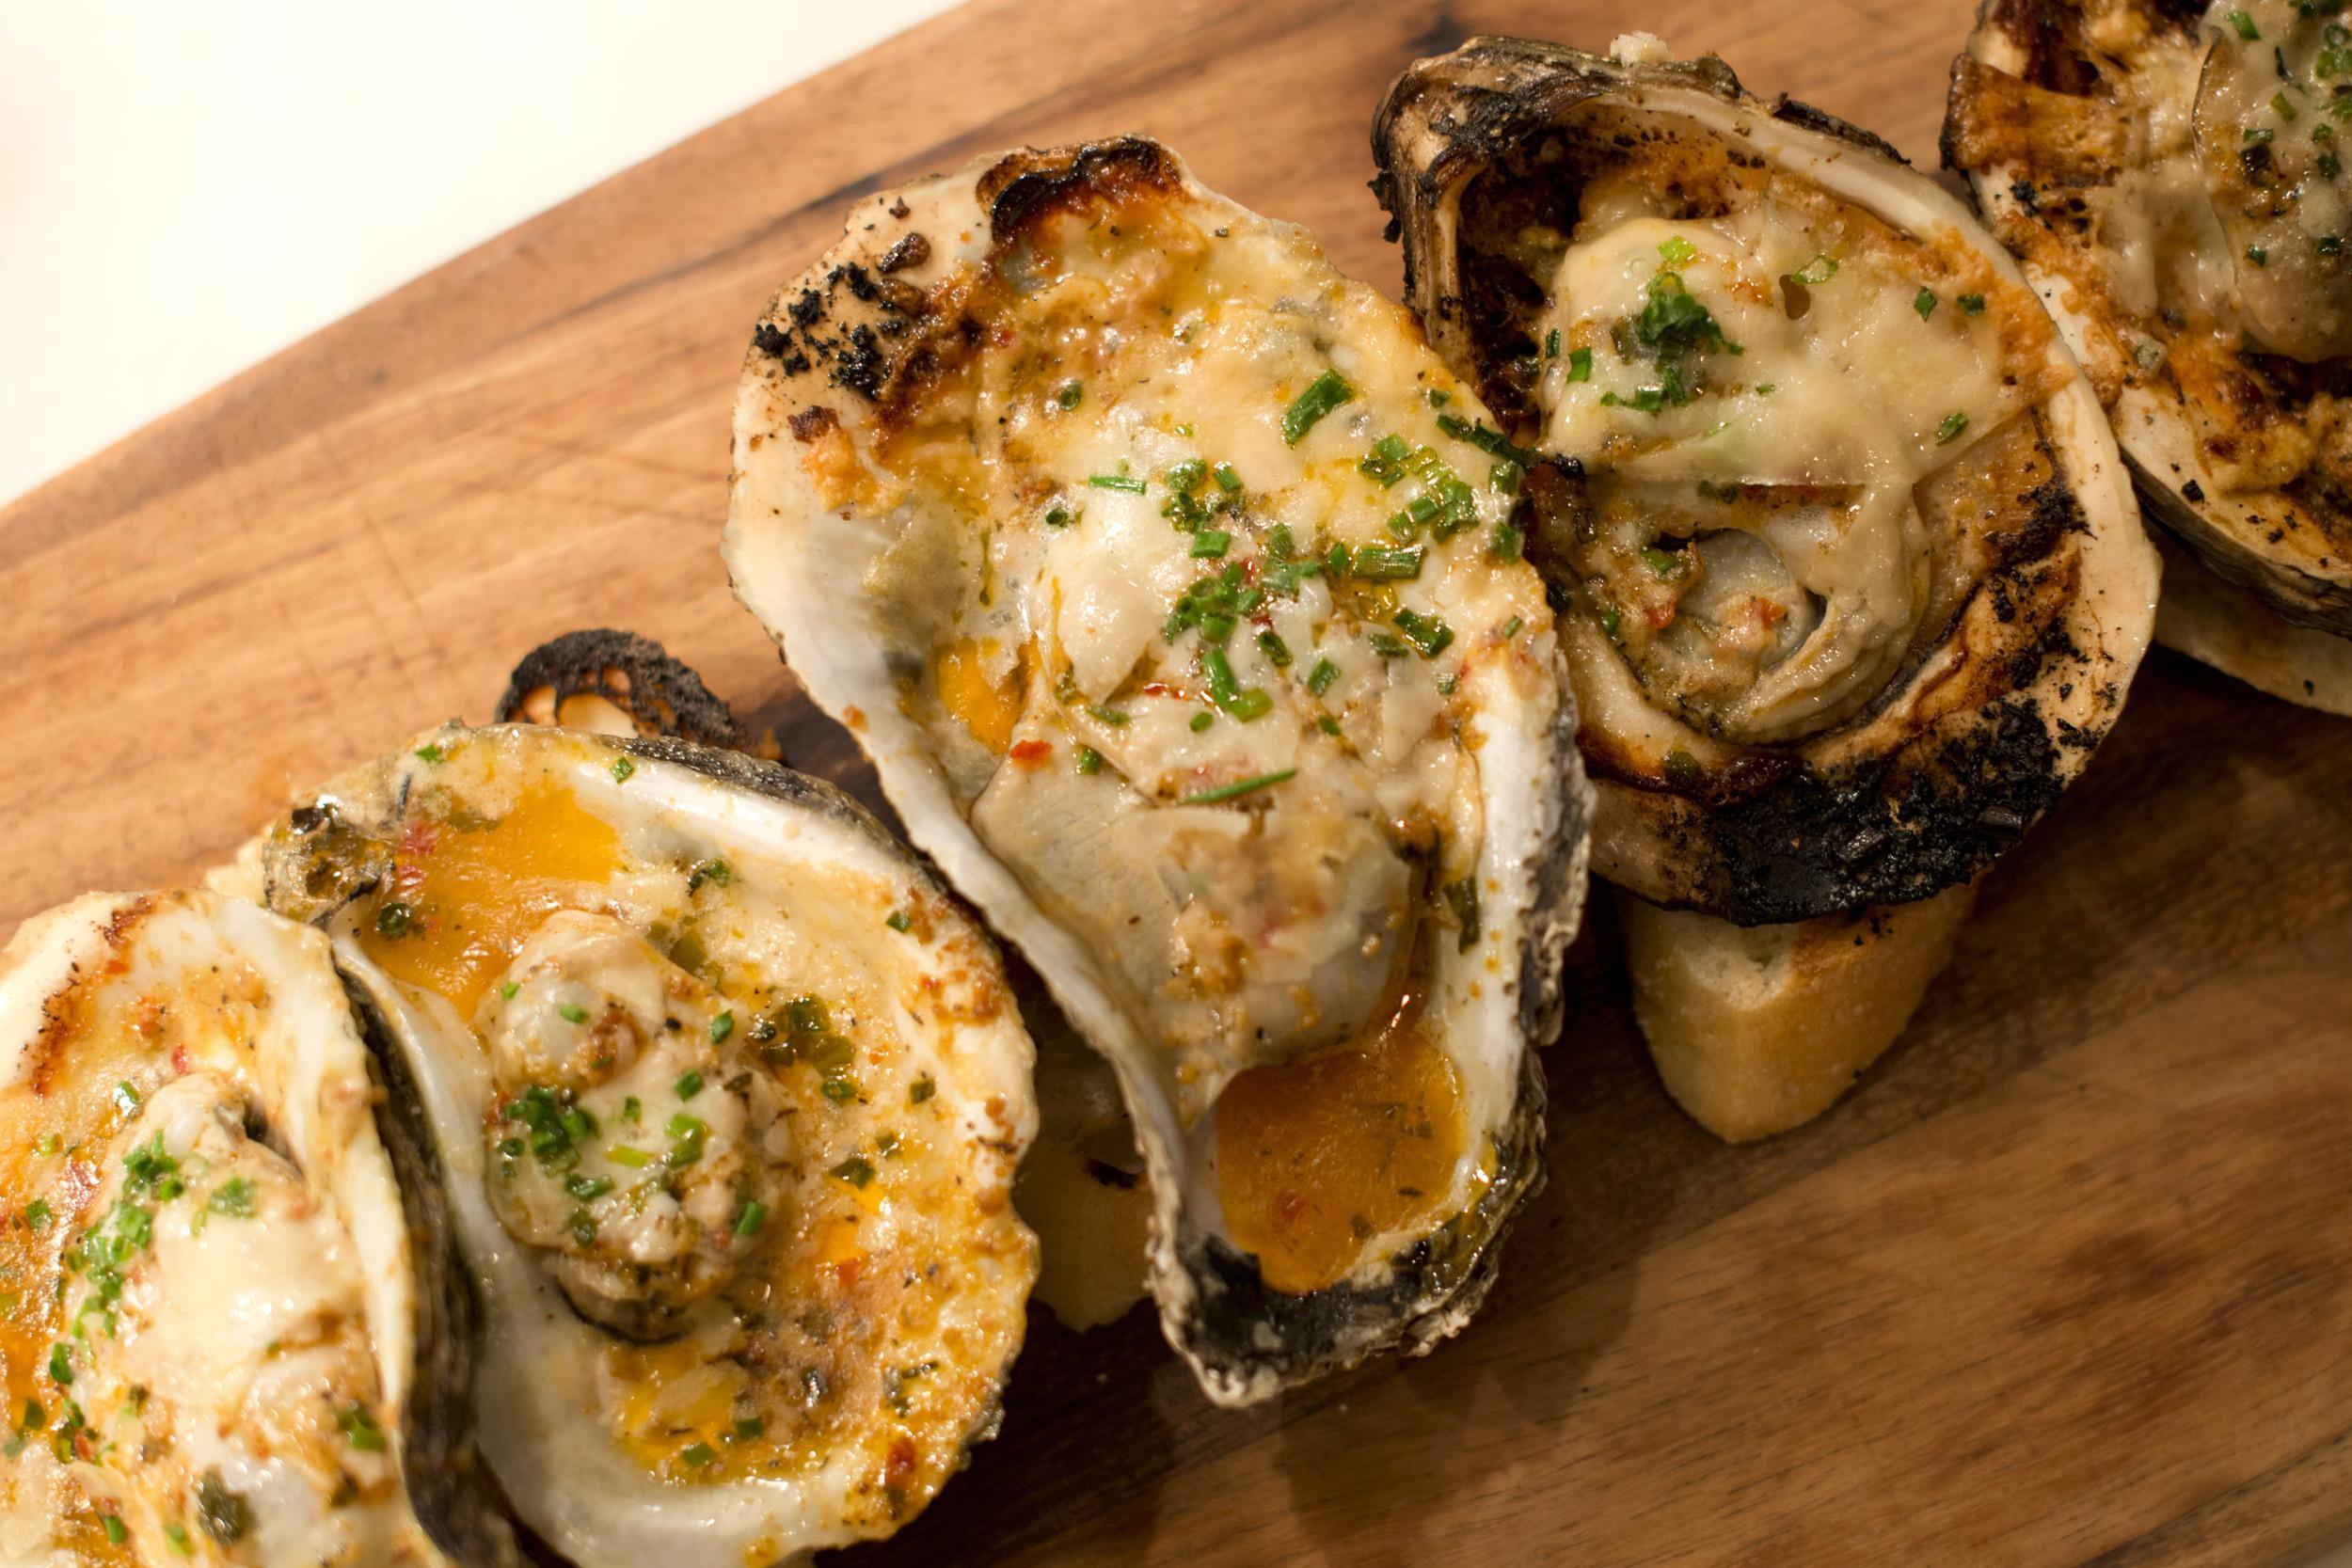 half dozen garlic and pecorino chard market oysters, lemon drops at Ariccia Italian Trattoria & Bar